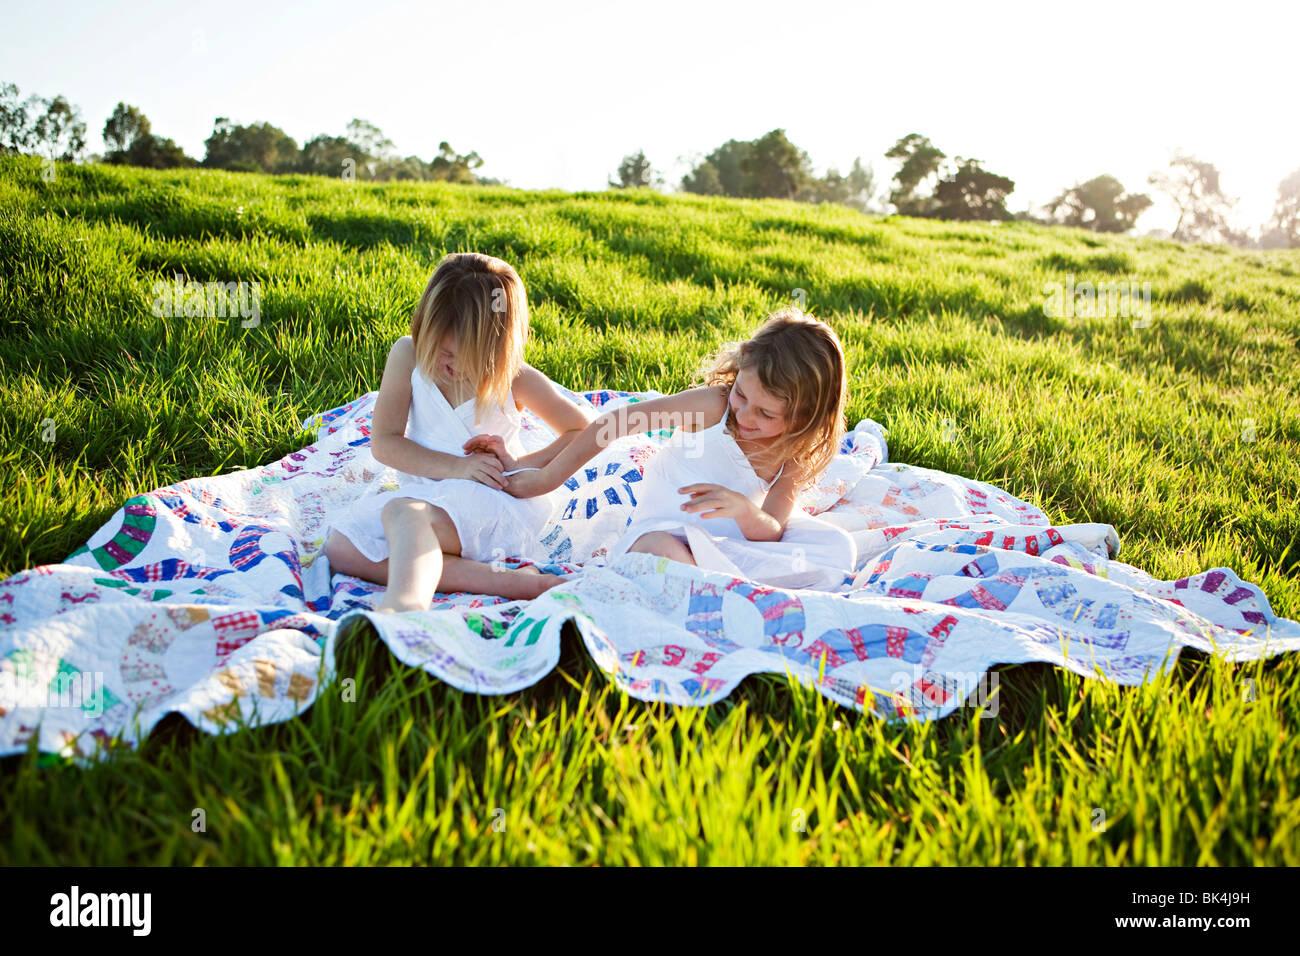 Girls on picnic blanket tickling each other - Stock Image